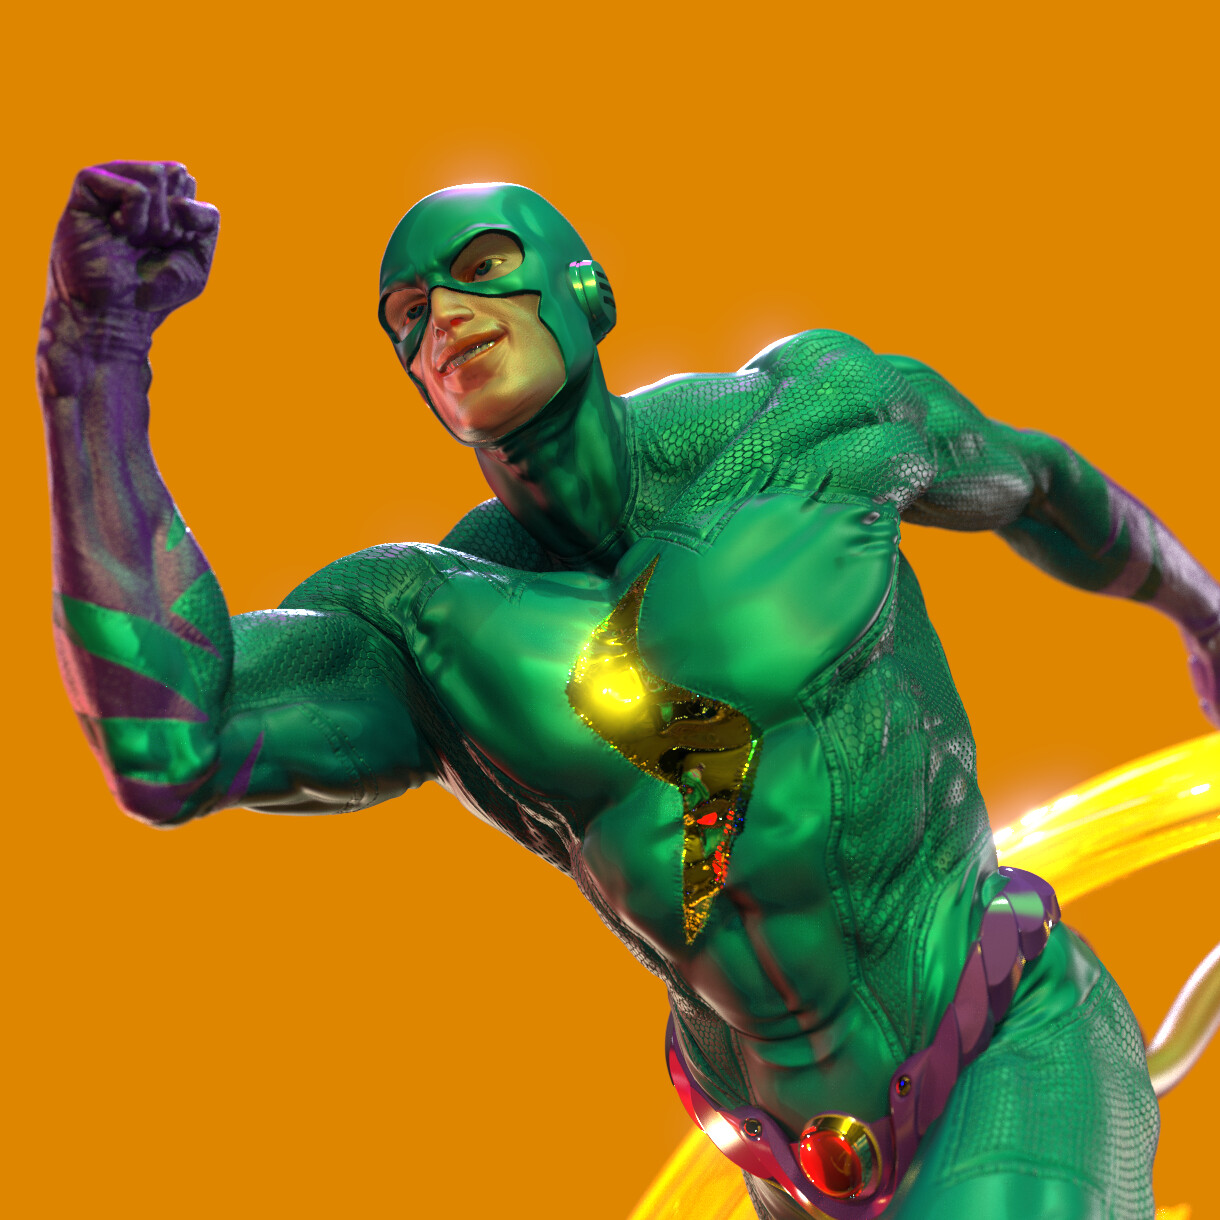 SuperGarr - Los Valientes